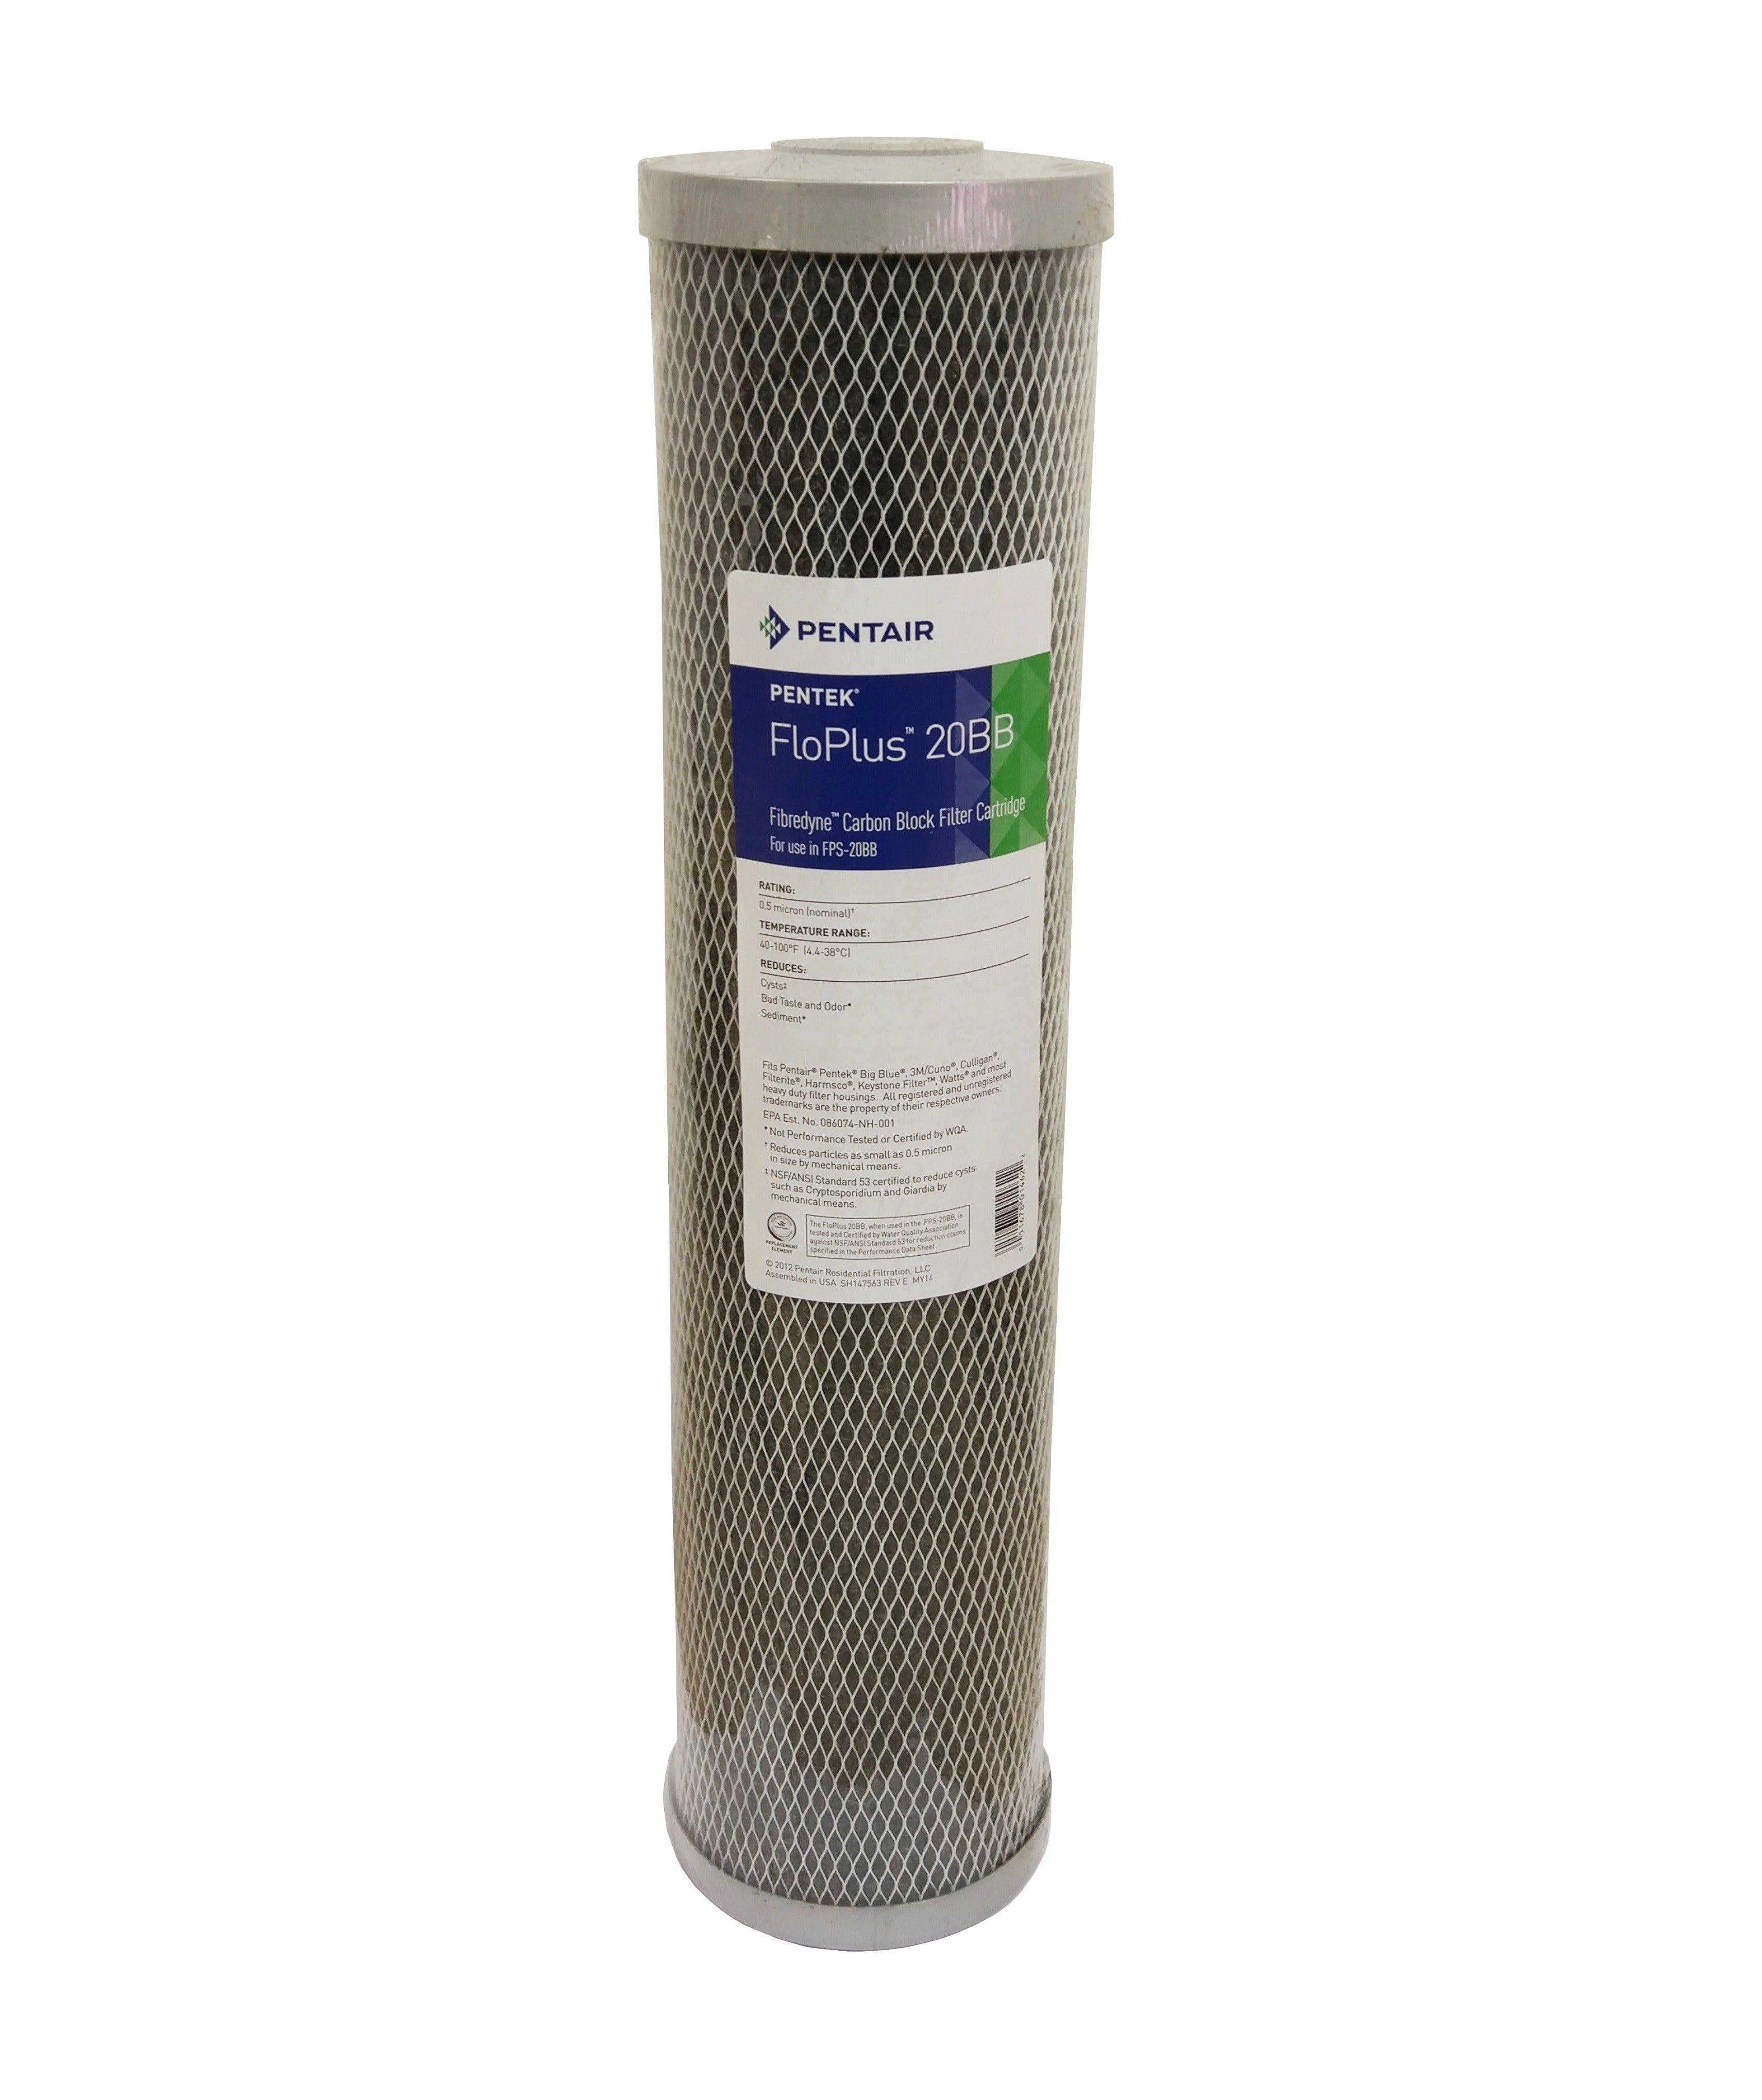 "Pentek FLOPLUS 20"" Jumbo 0.5 Micron Carbon Block Water Filter"